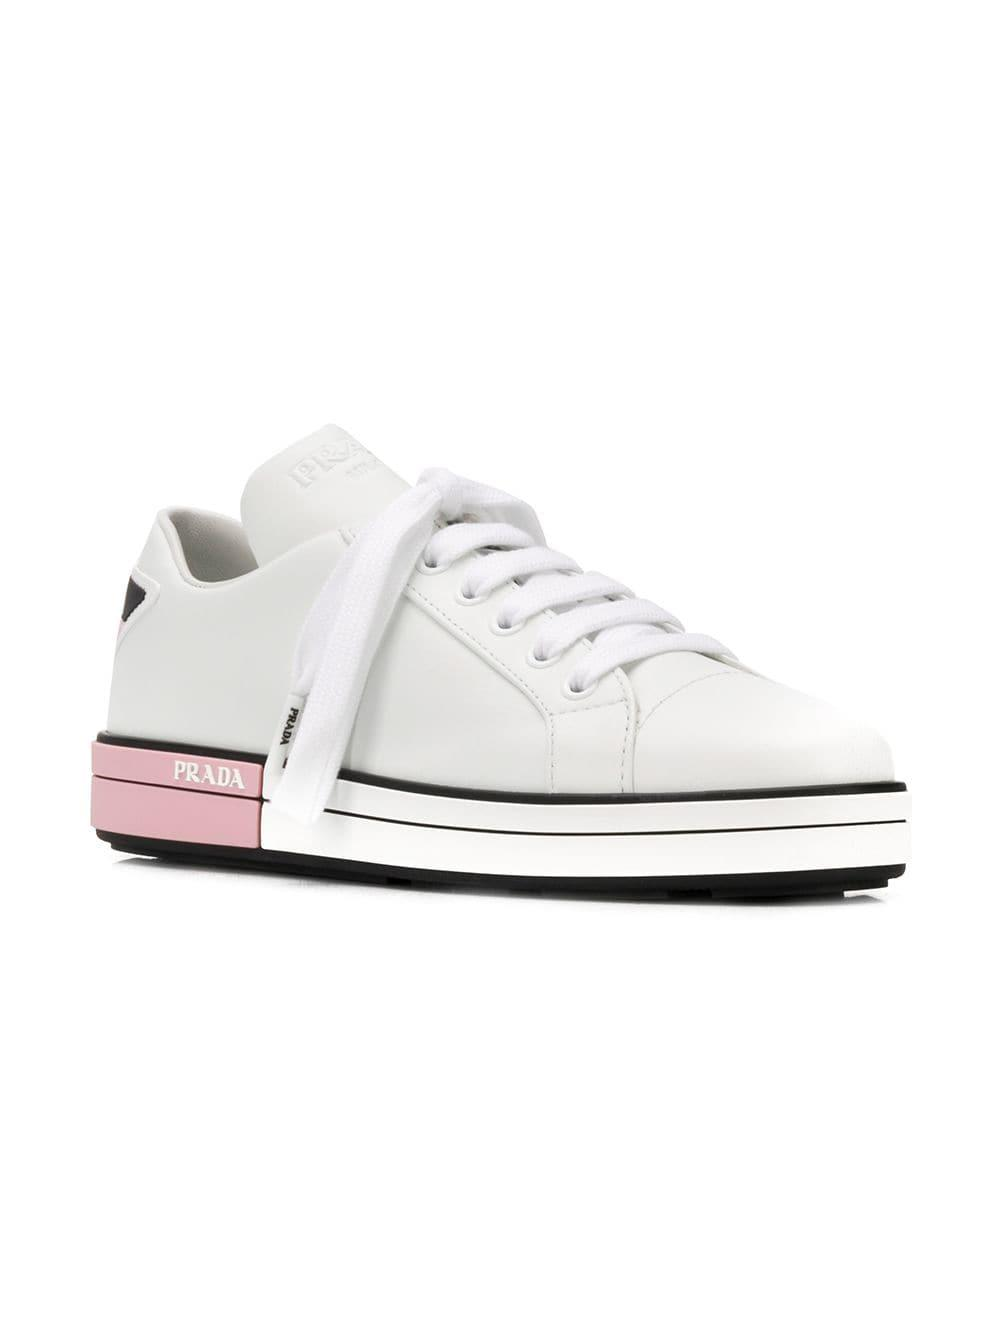 65c0c16b050 Lyst - Prada Platform Sneakers in White - Save 6%